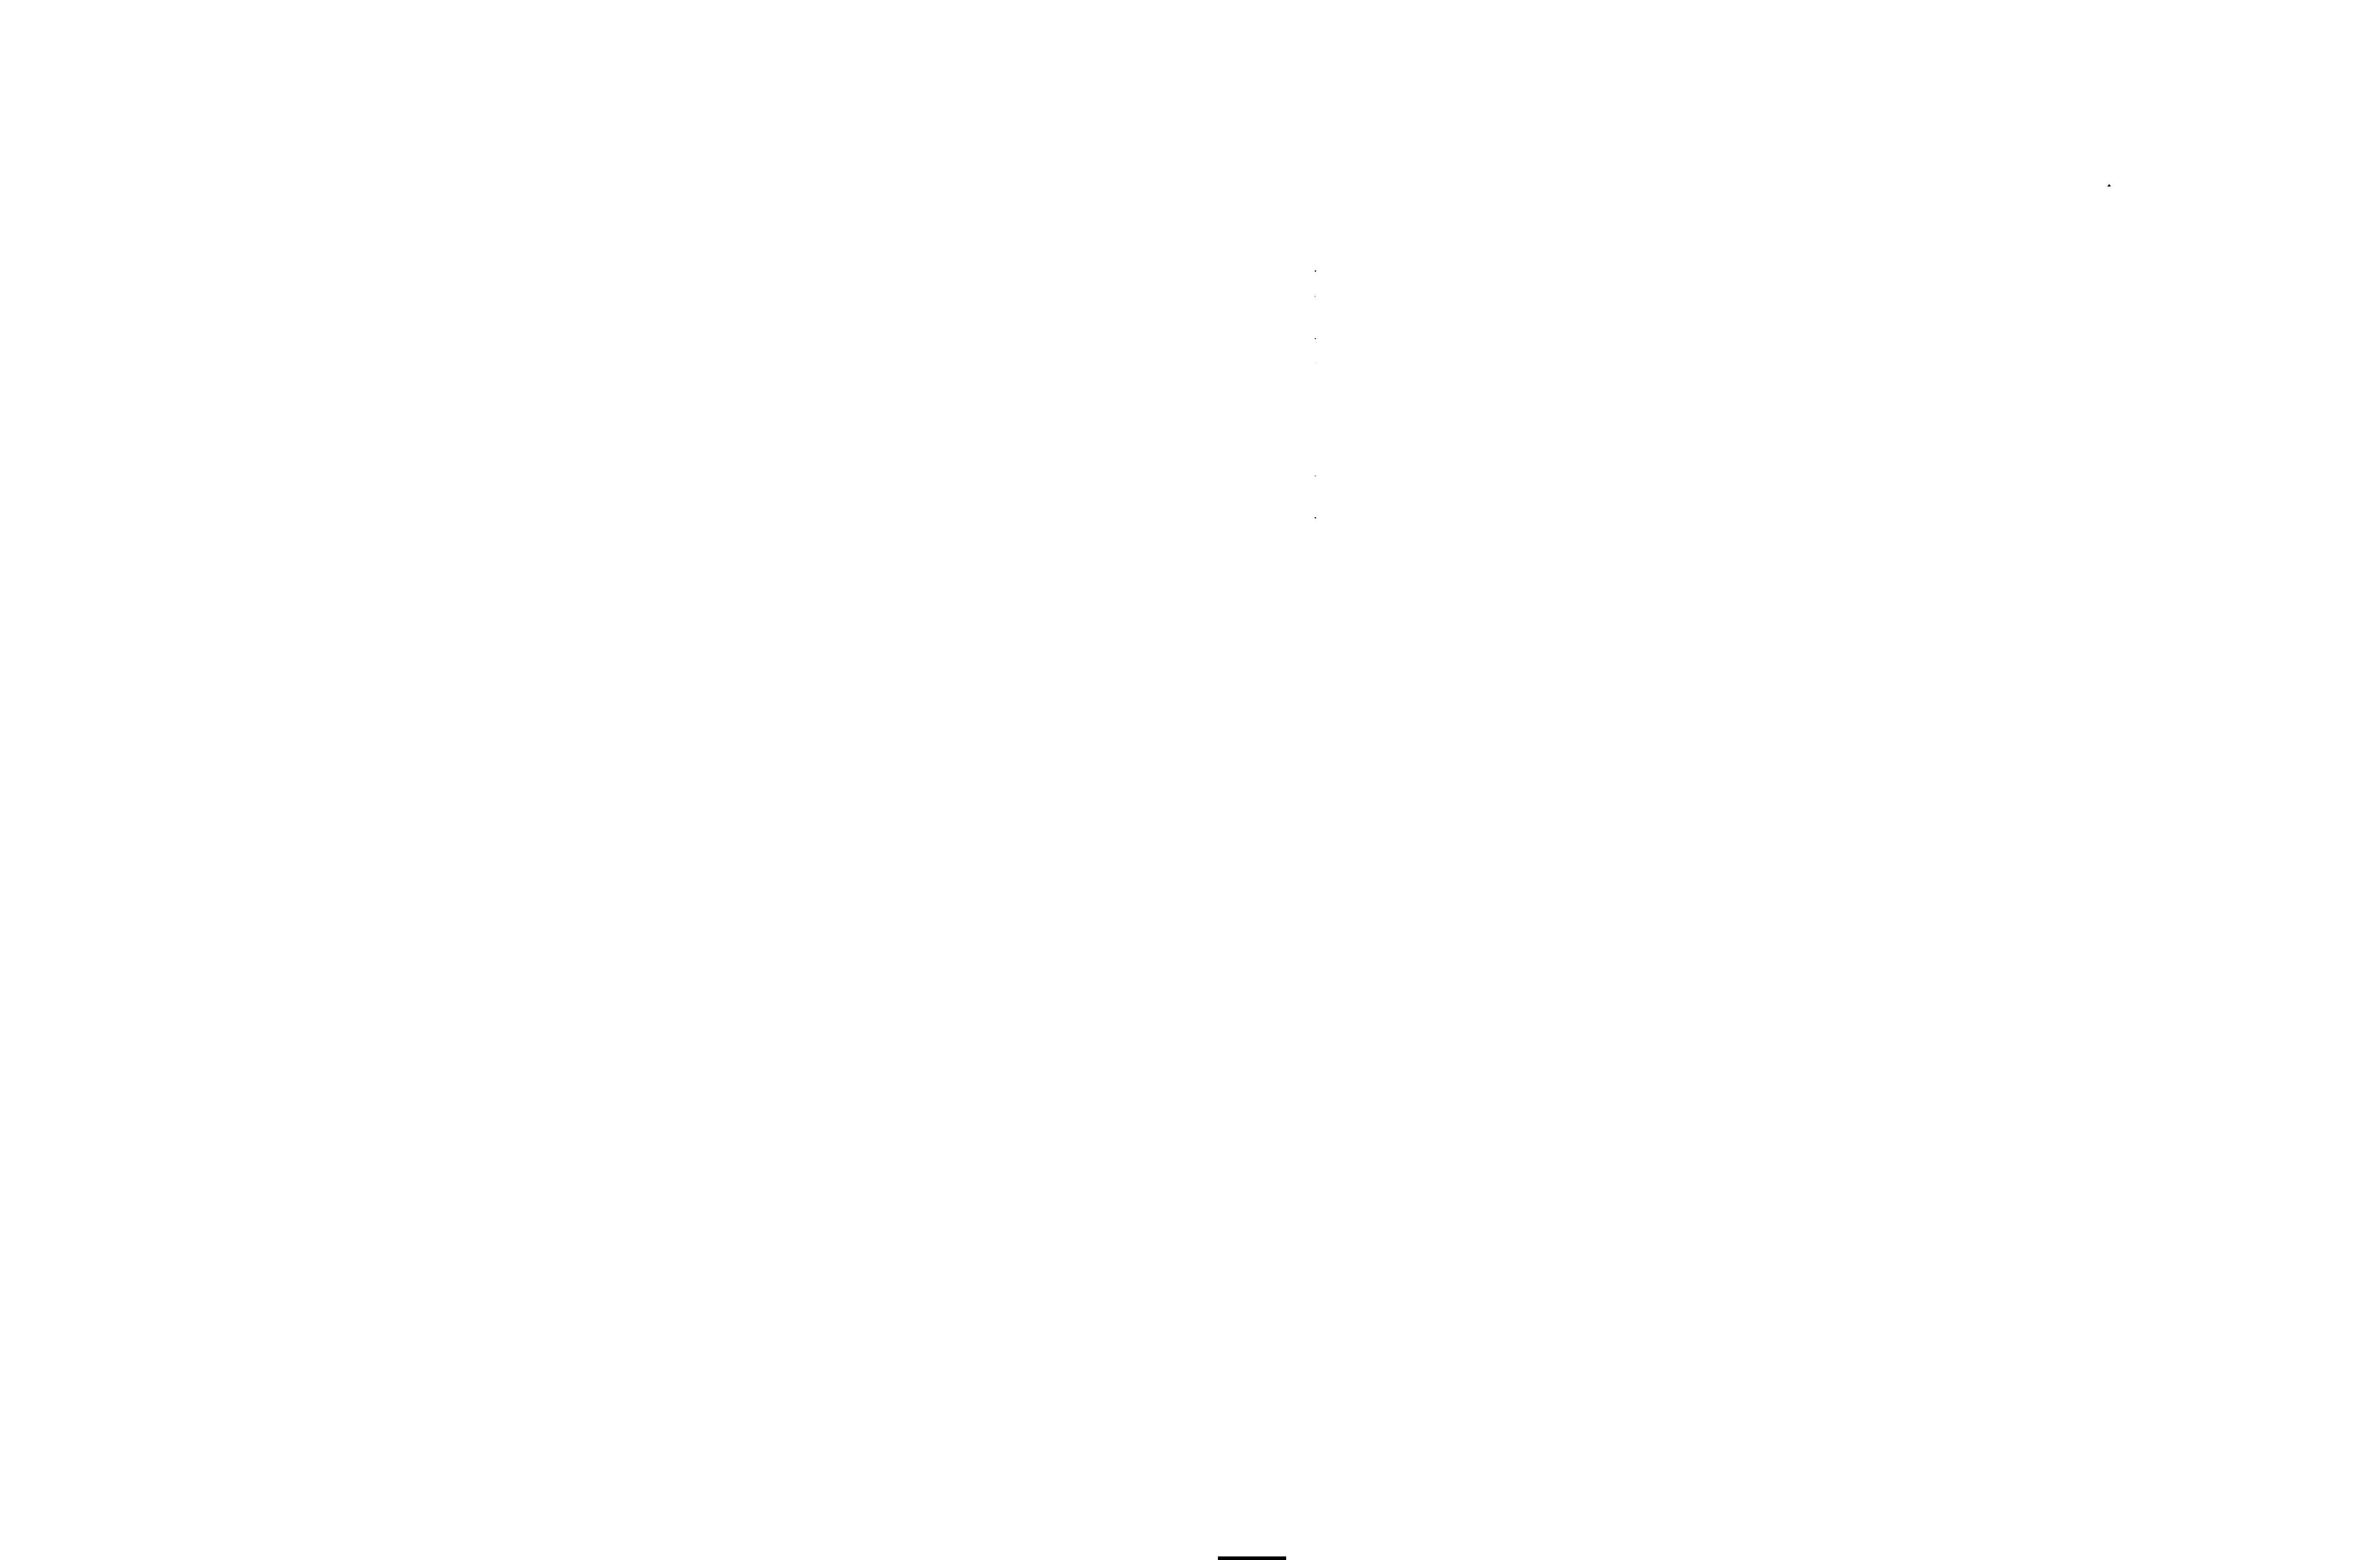 ProgrammingFever